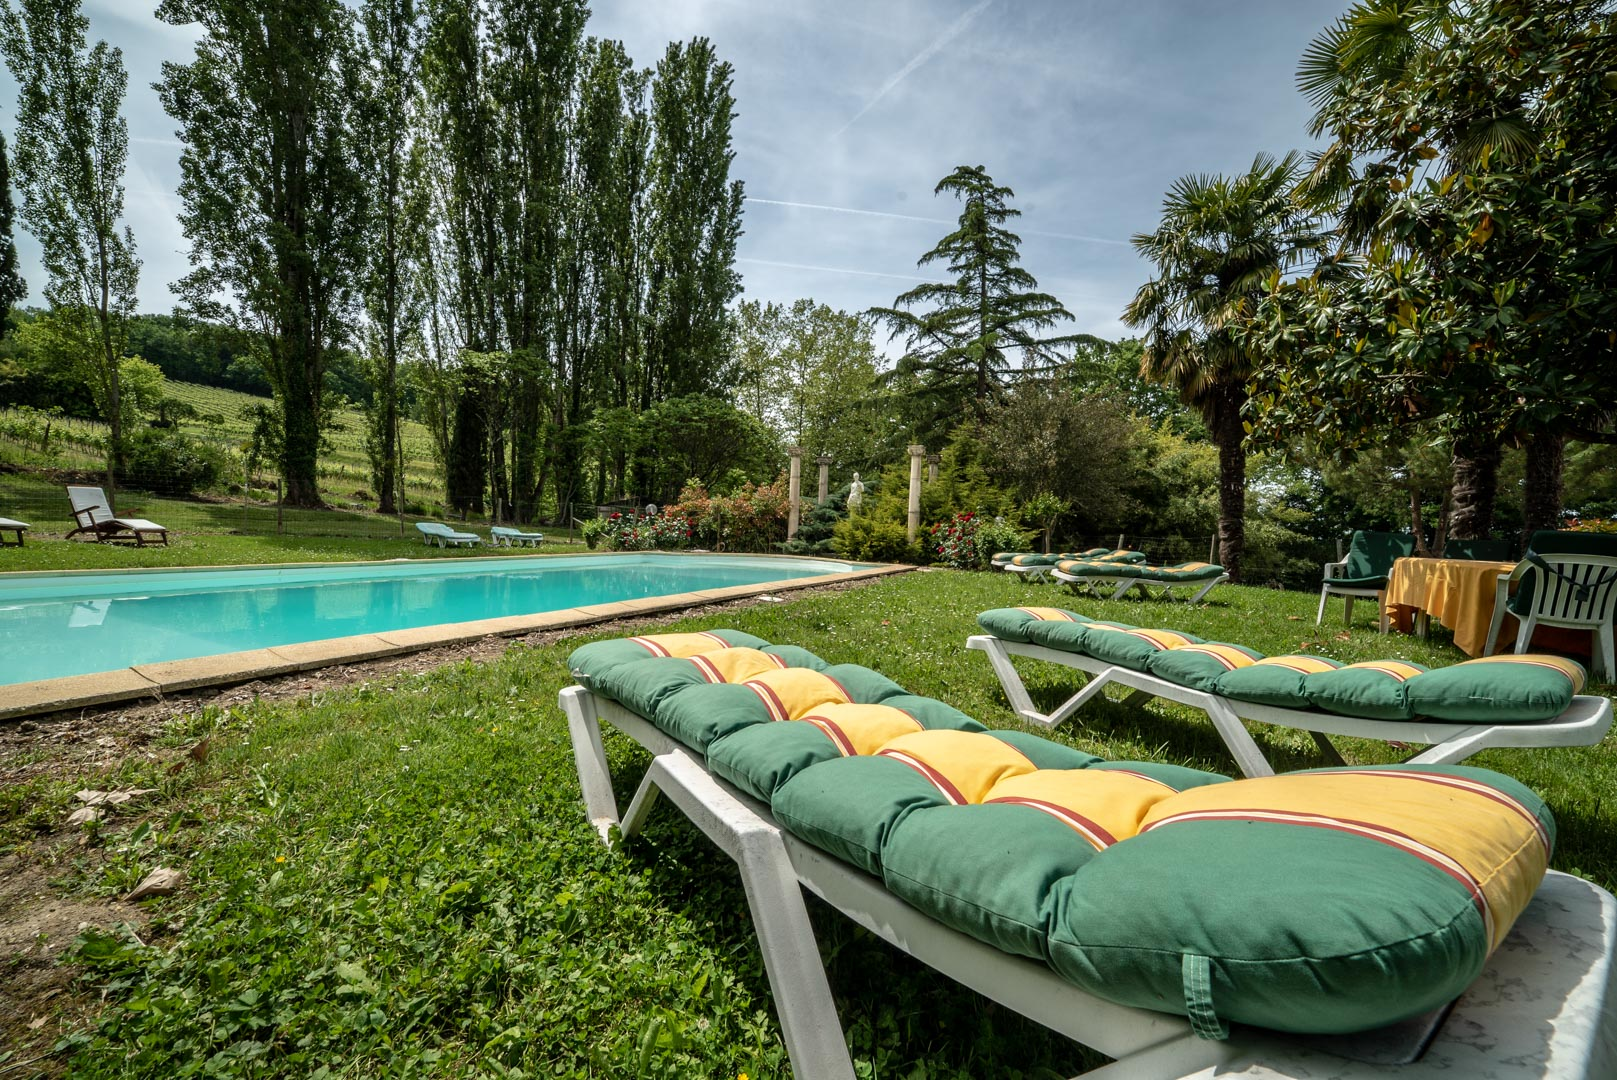 Piscine Chateau Rauly location bergerac Monbazillac